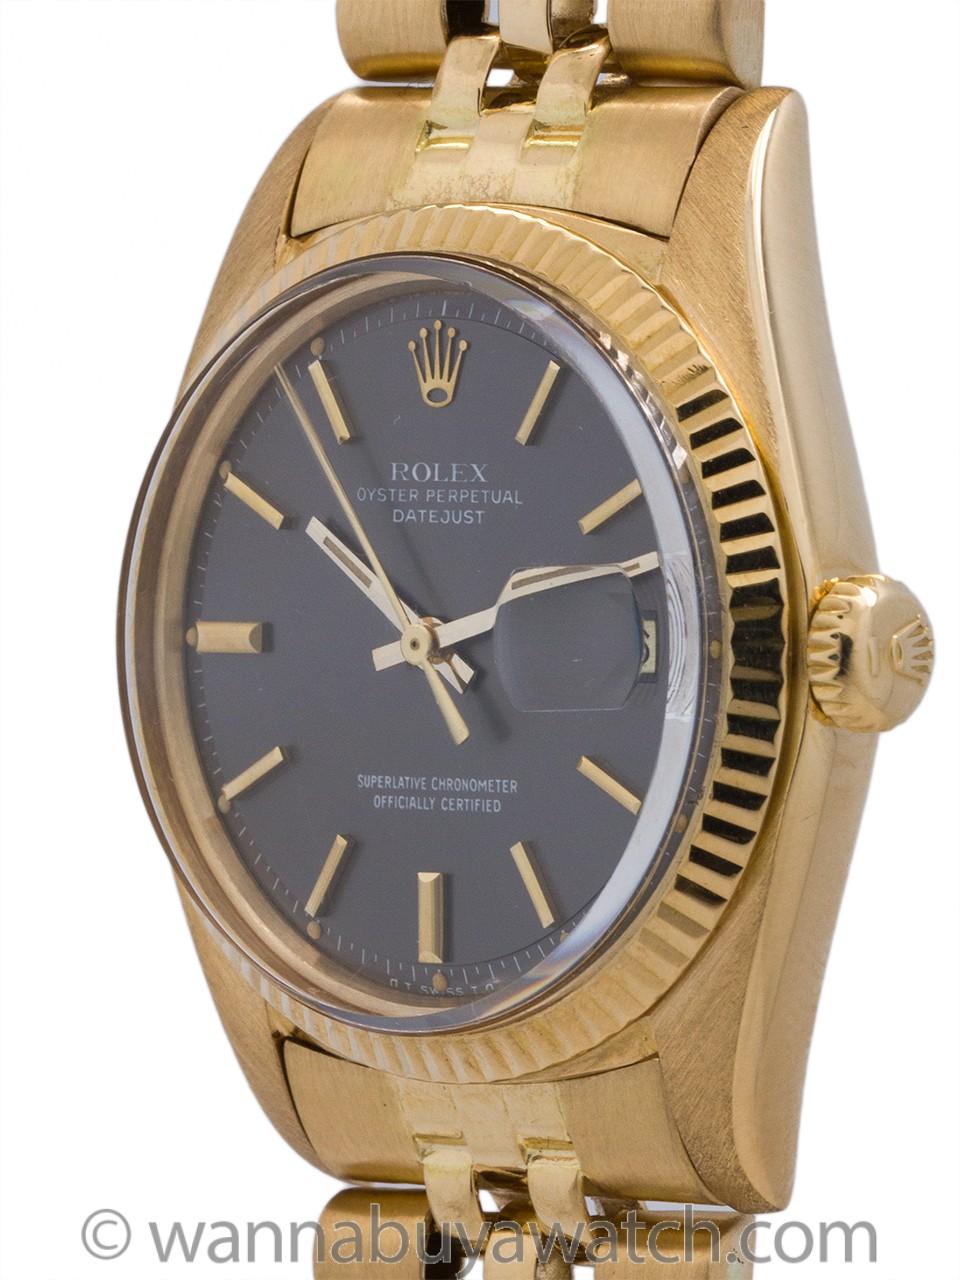 Rolex 18K Gold Datejust ref 1601 Gray Dial circa 1974